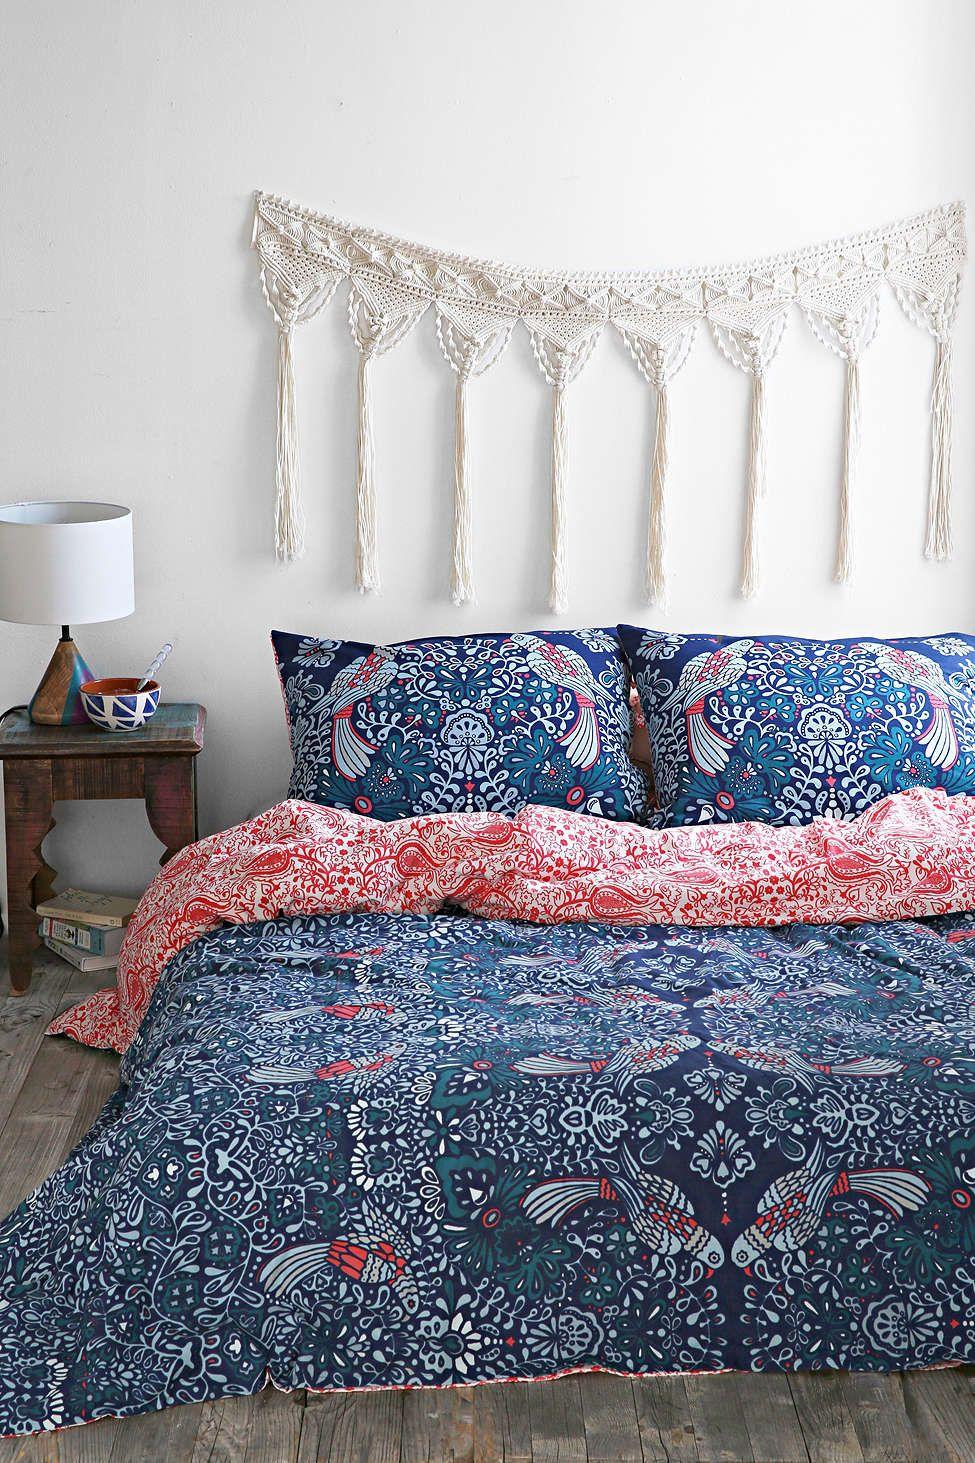 Plum u bow mirrored love birds duvet cover duvet warm bedroom and